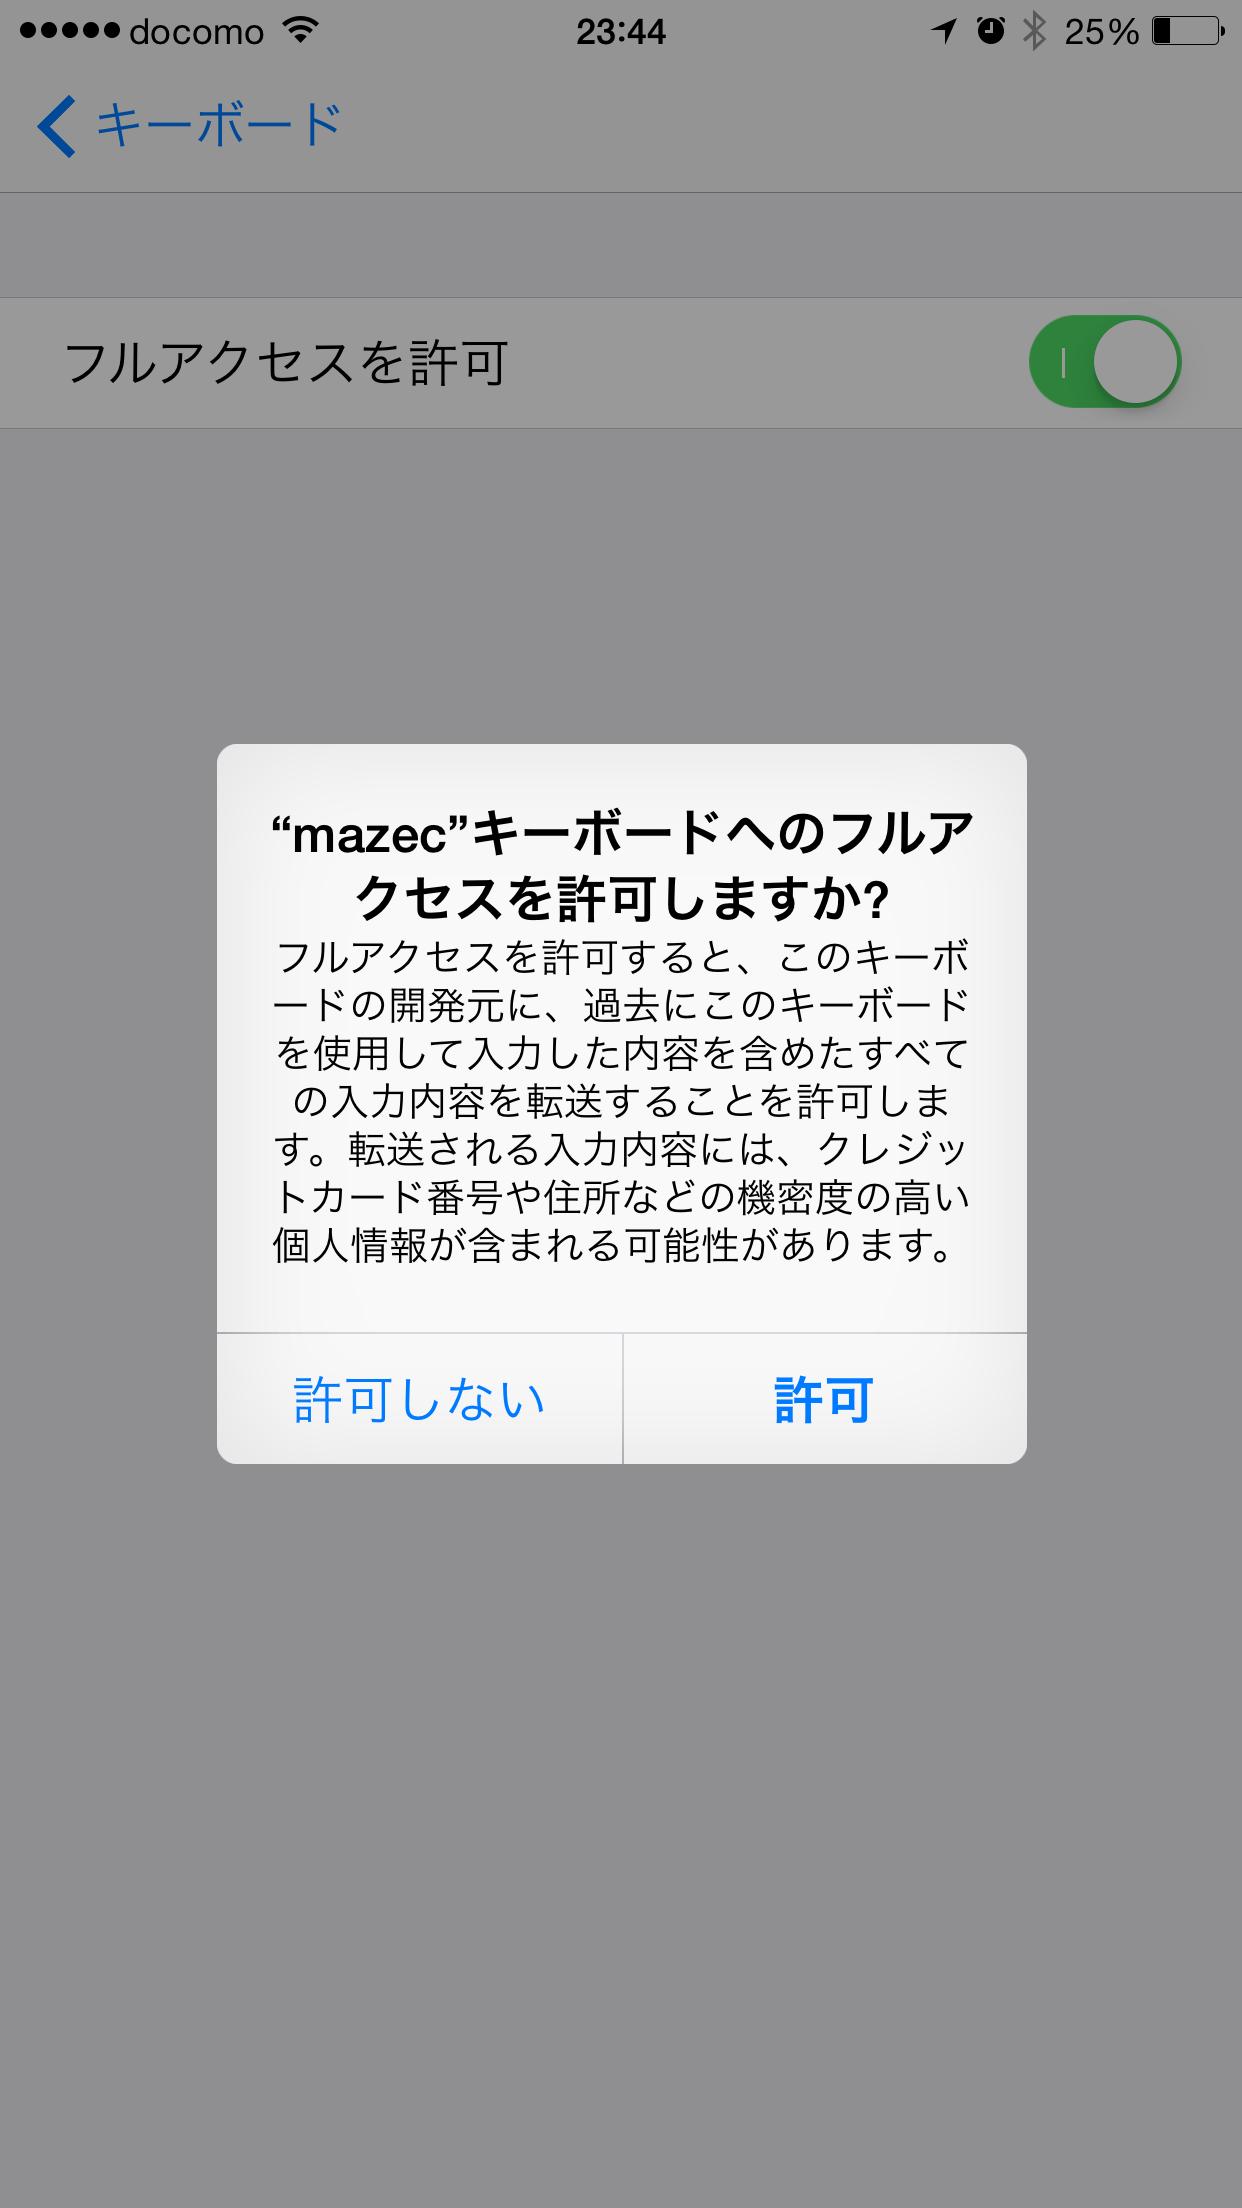 2014-09-26 23.44.28